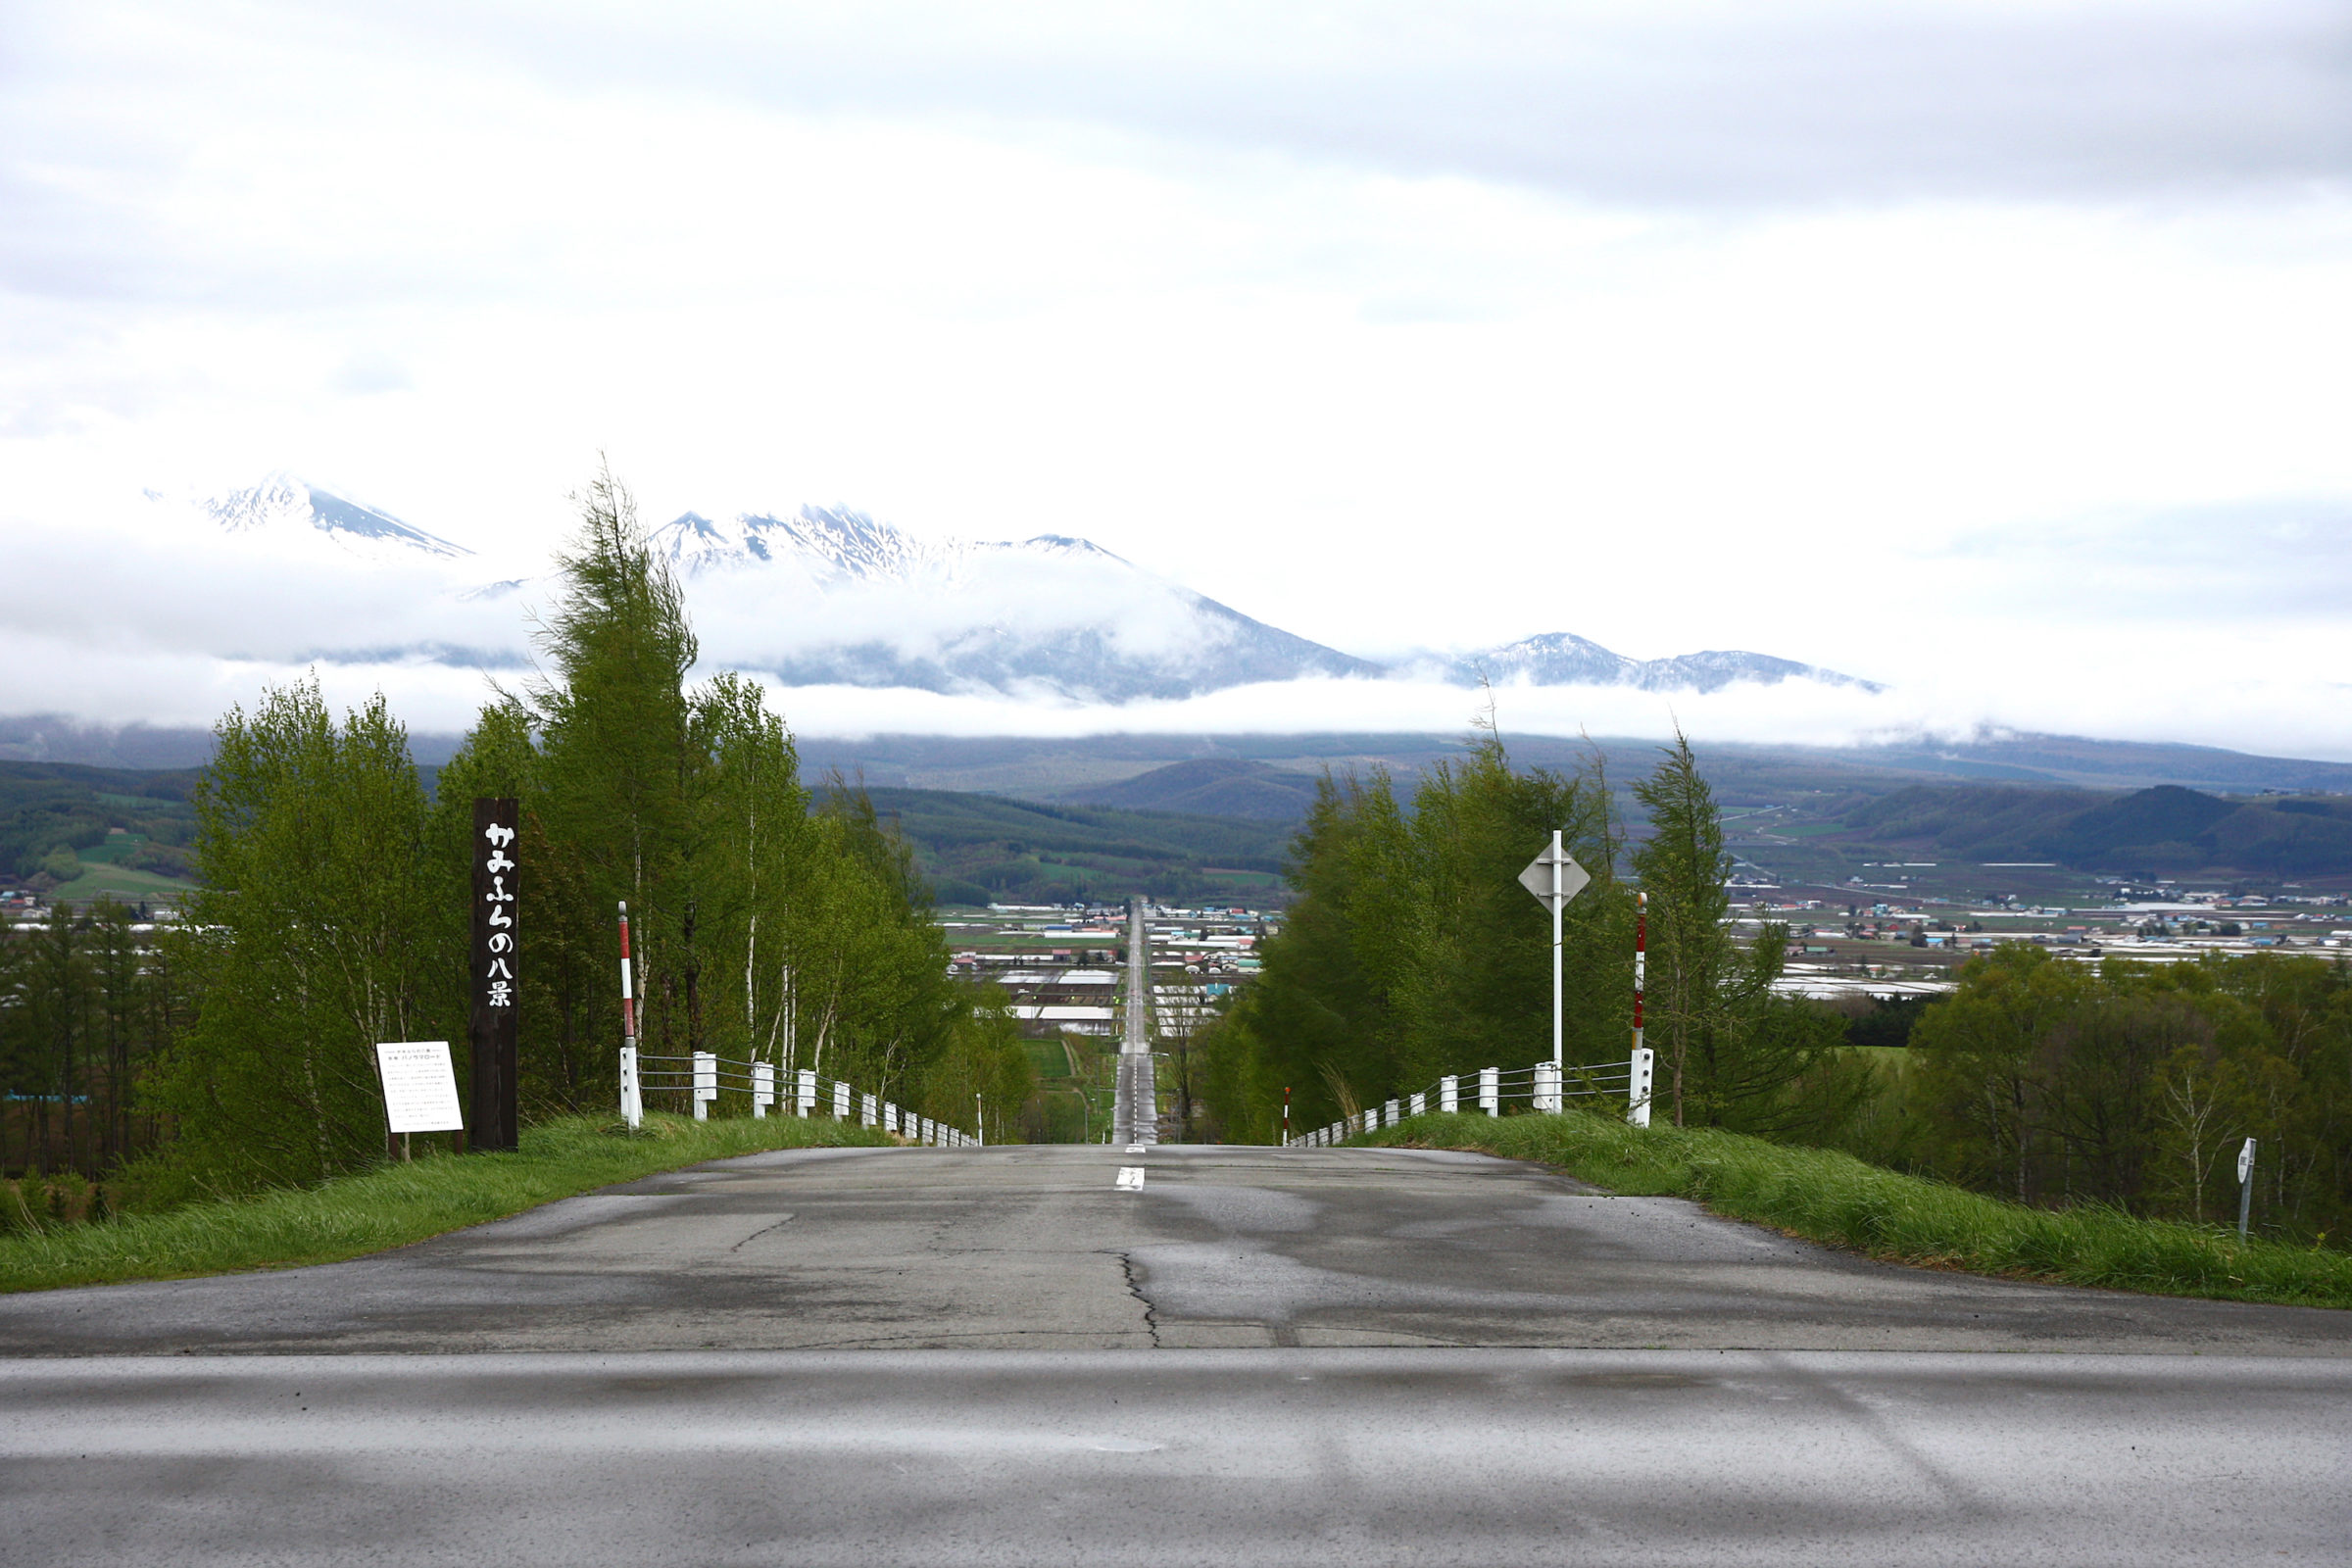 Hokkaido Road Trip Itinerary, Day 6 & 7: Furano & Biei